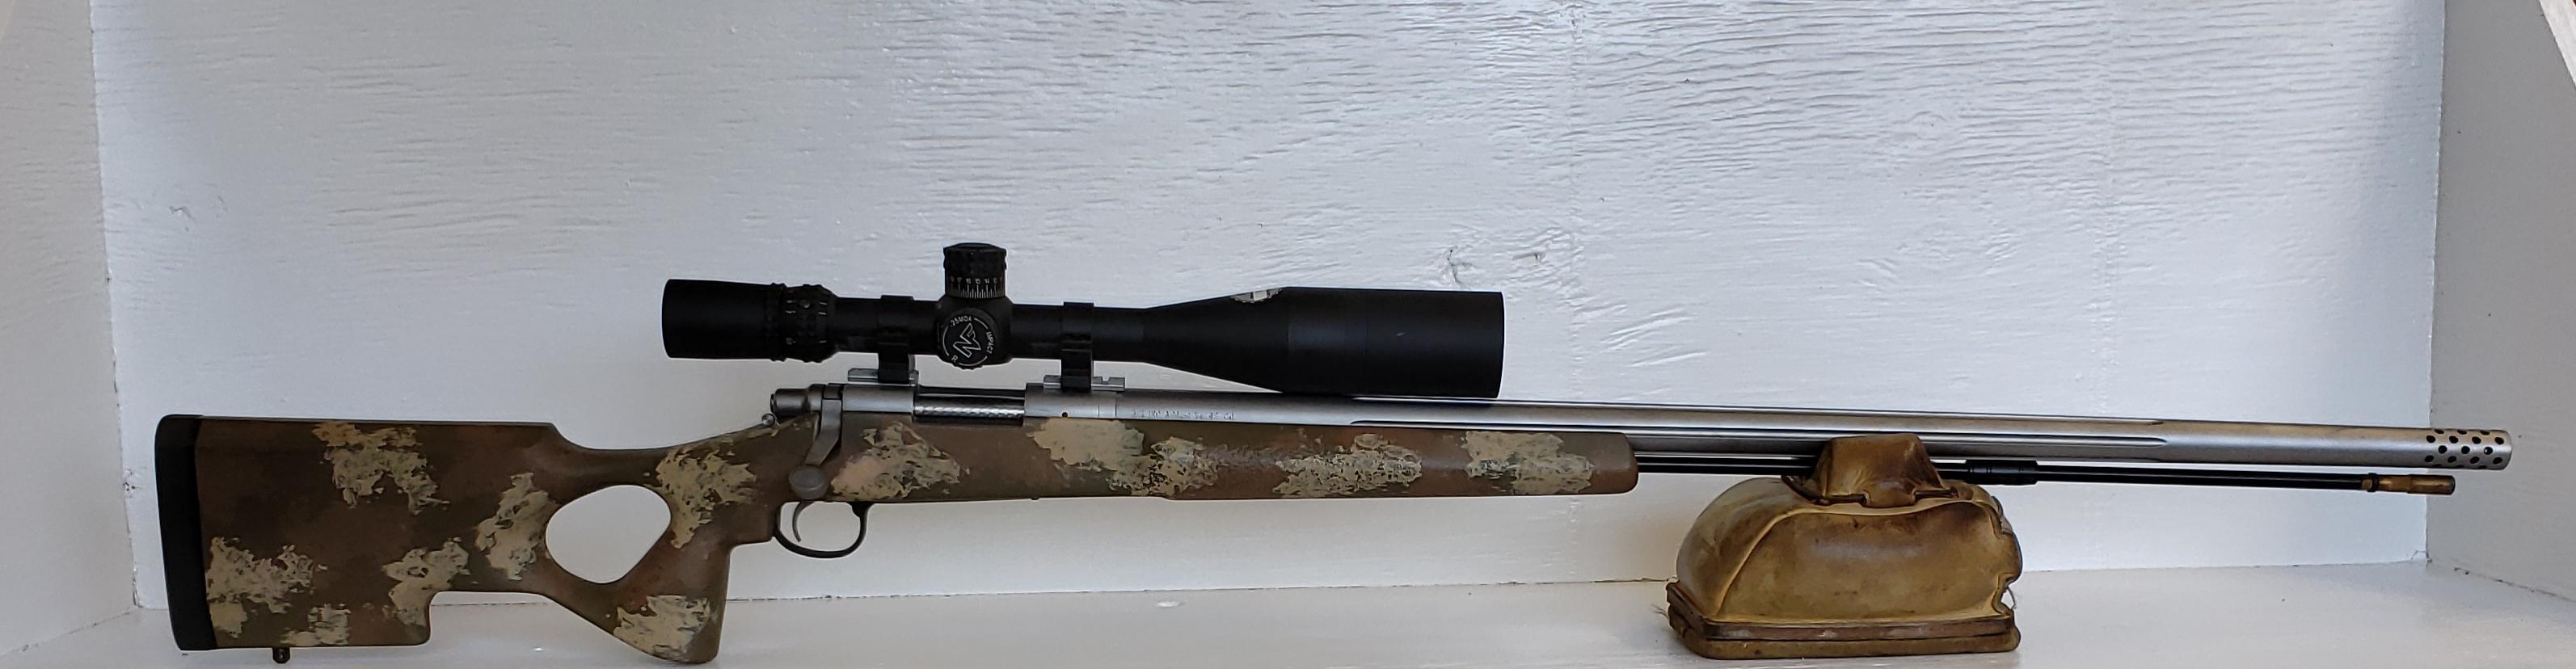 Ashland Gun Innovations| Ashland Va| Smokeless Muzzleloaders